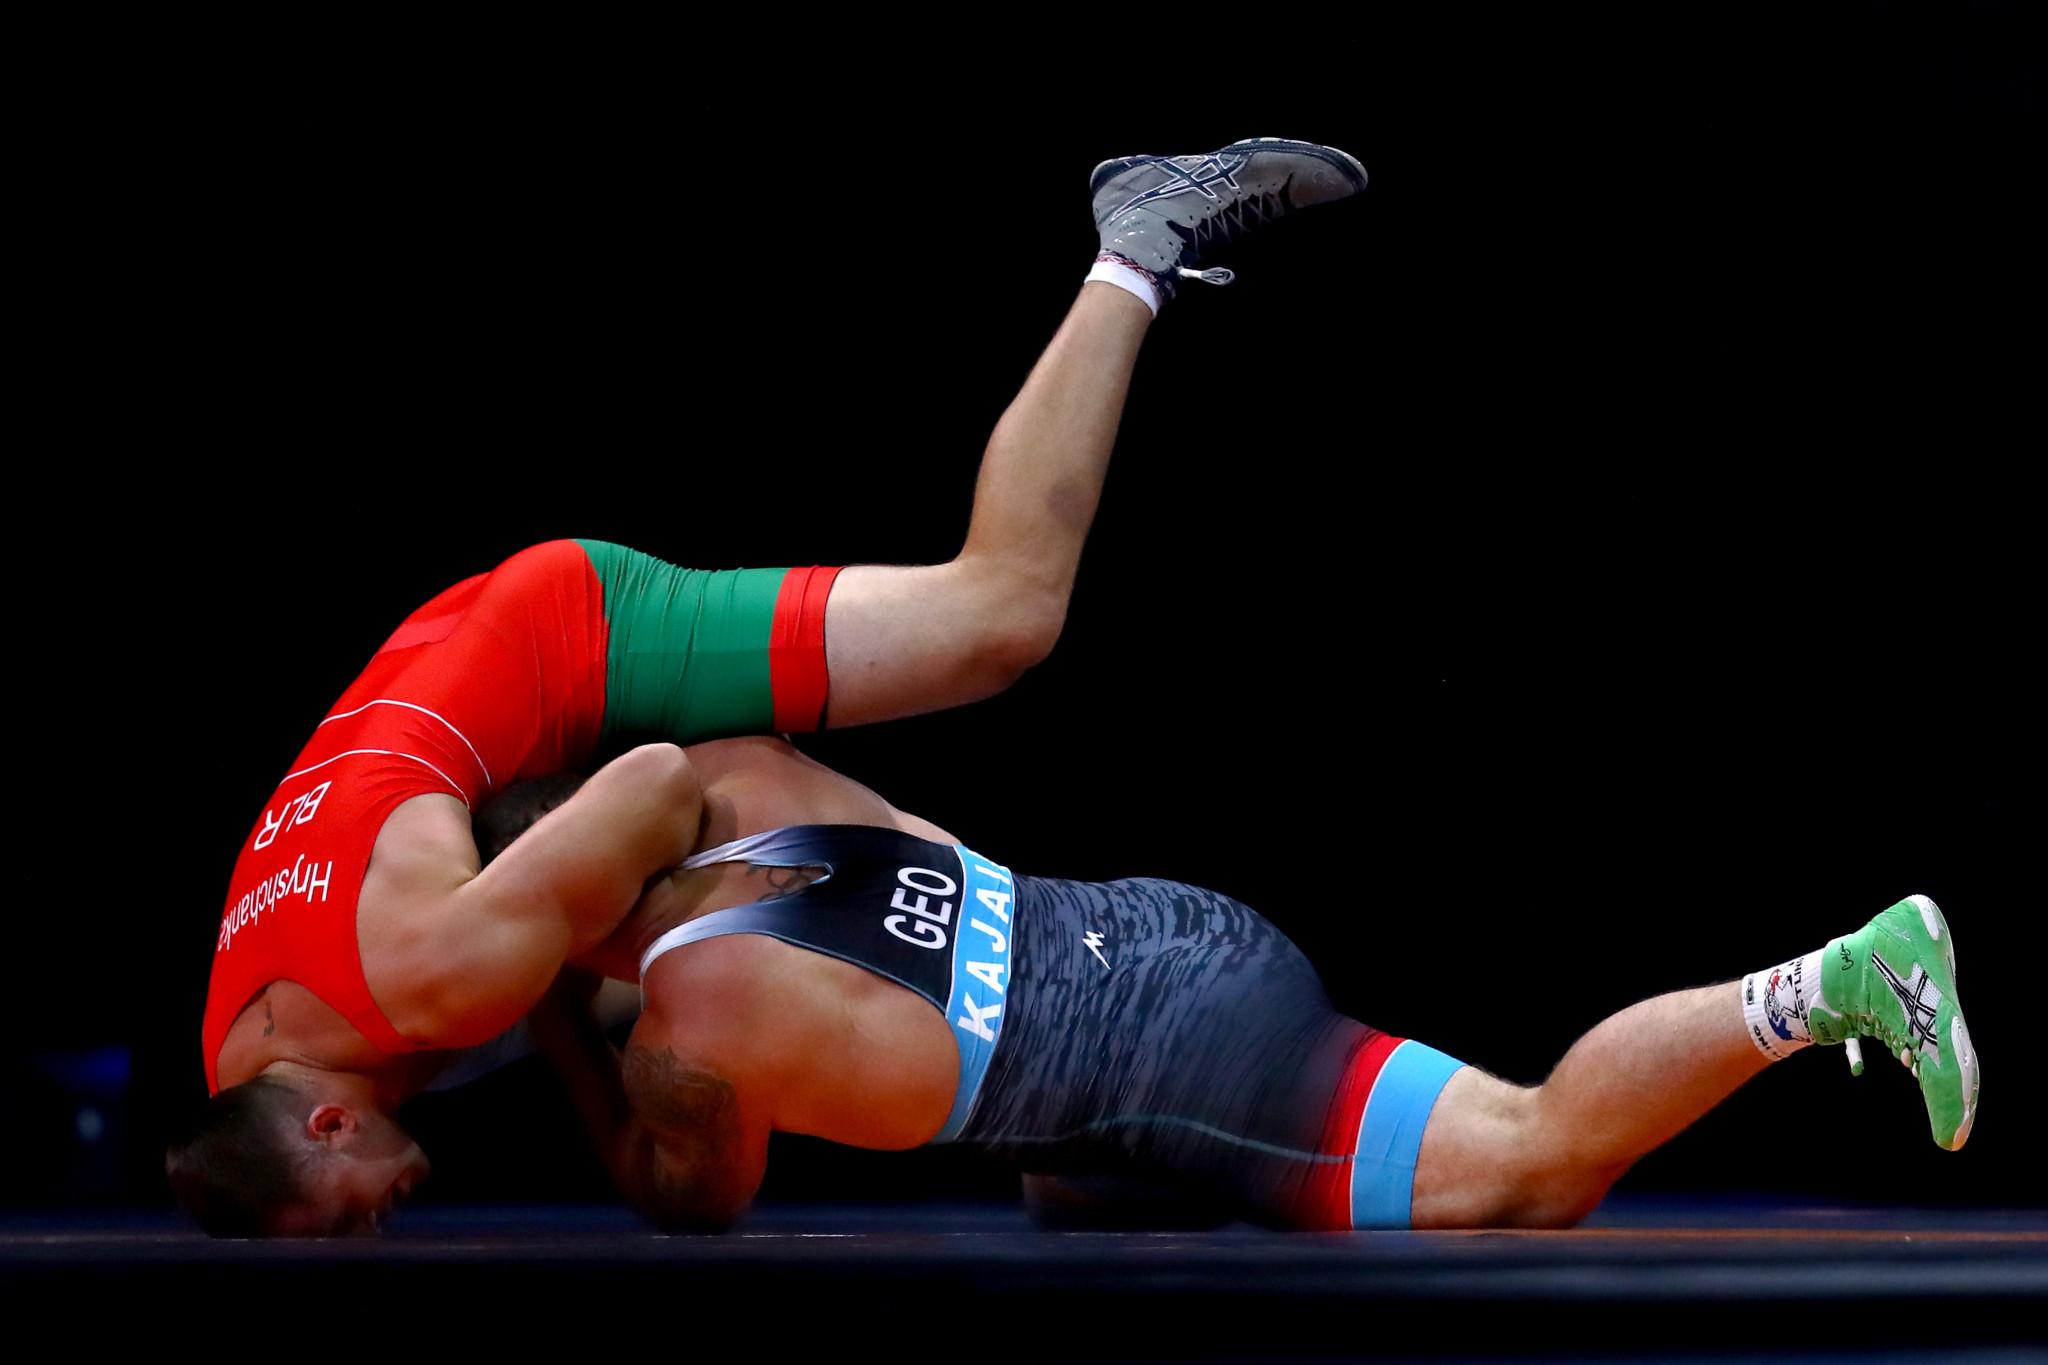 Kiryl Hryshchanka beat Georgian Iakob Kajaia 5-1 in the 130kg Greco-Roman gold medal bout at Minsk 2019 ©Getty Images